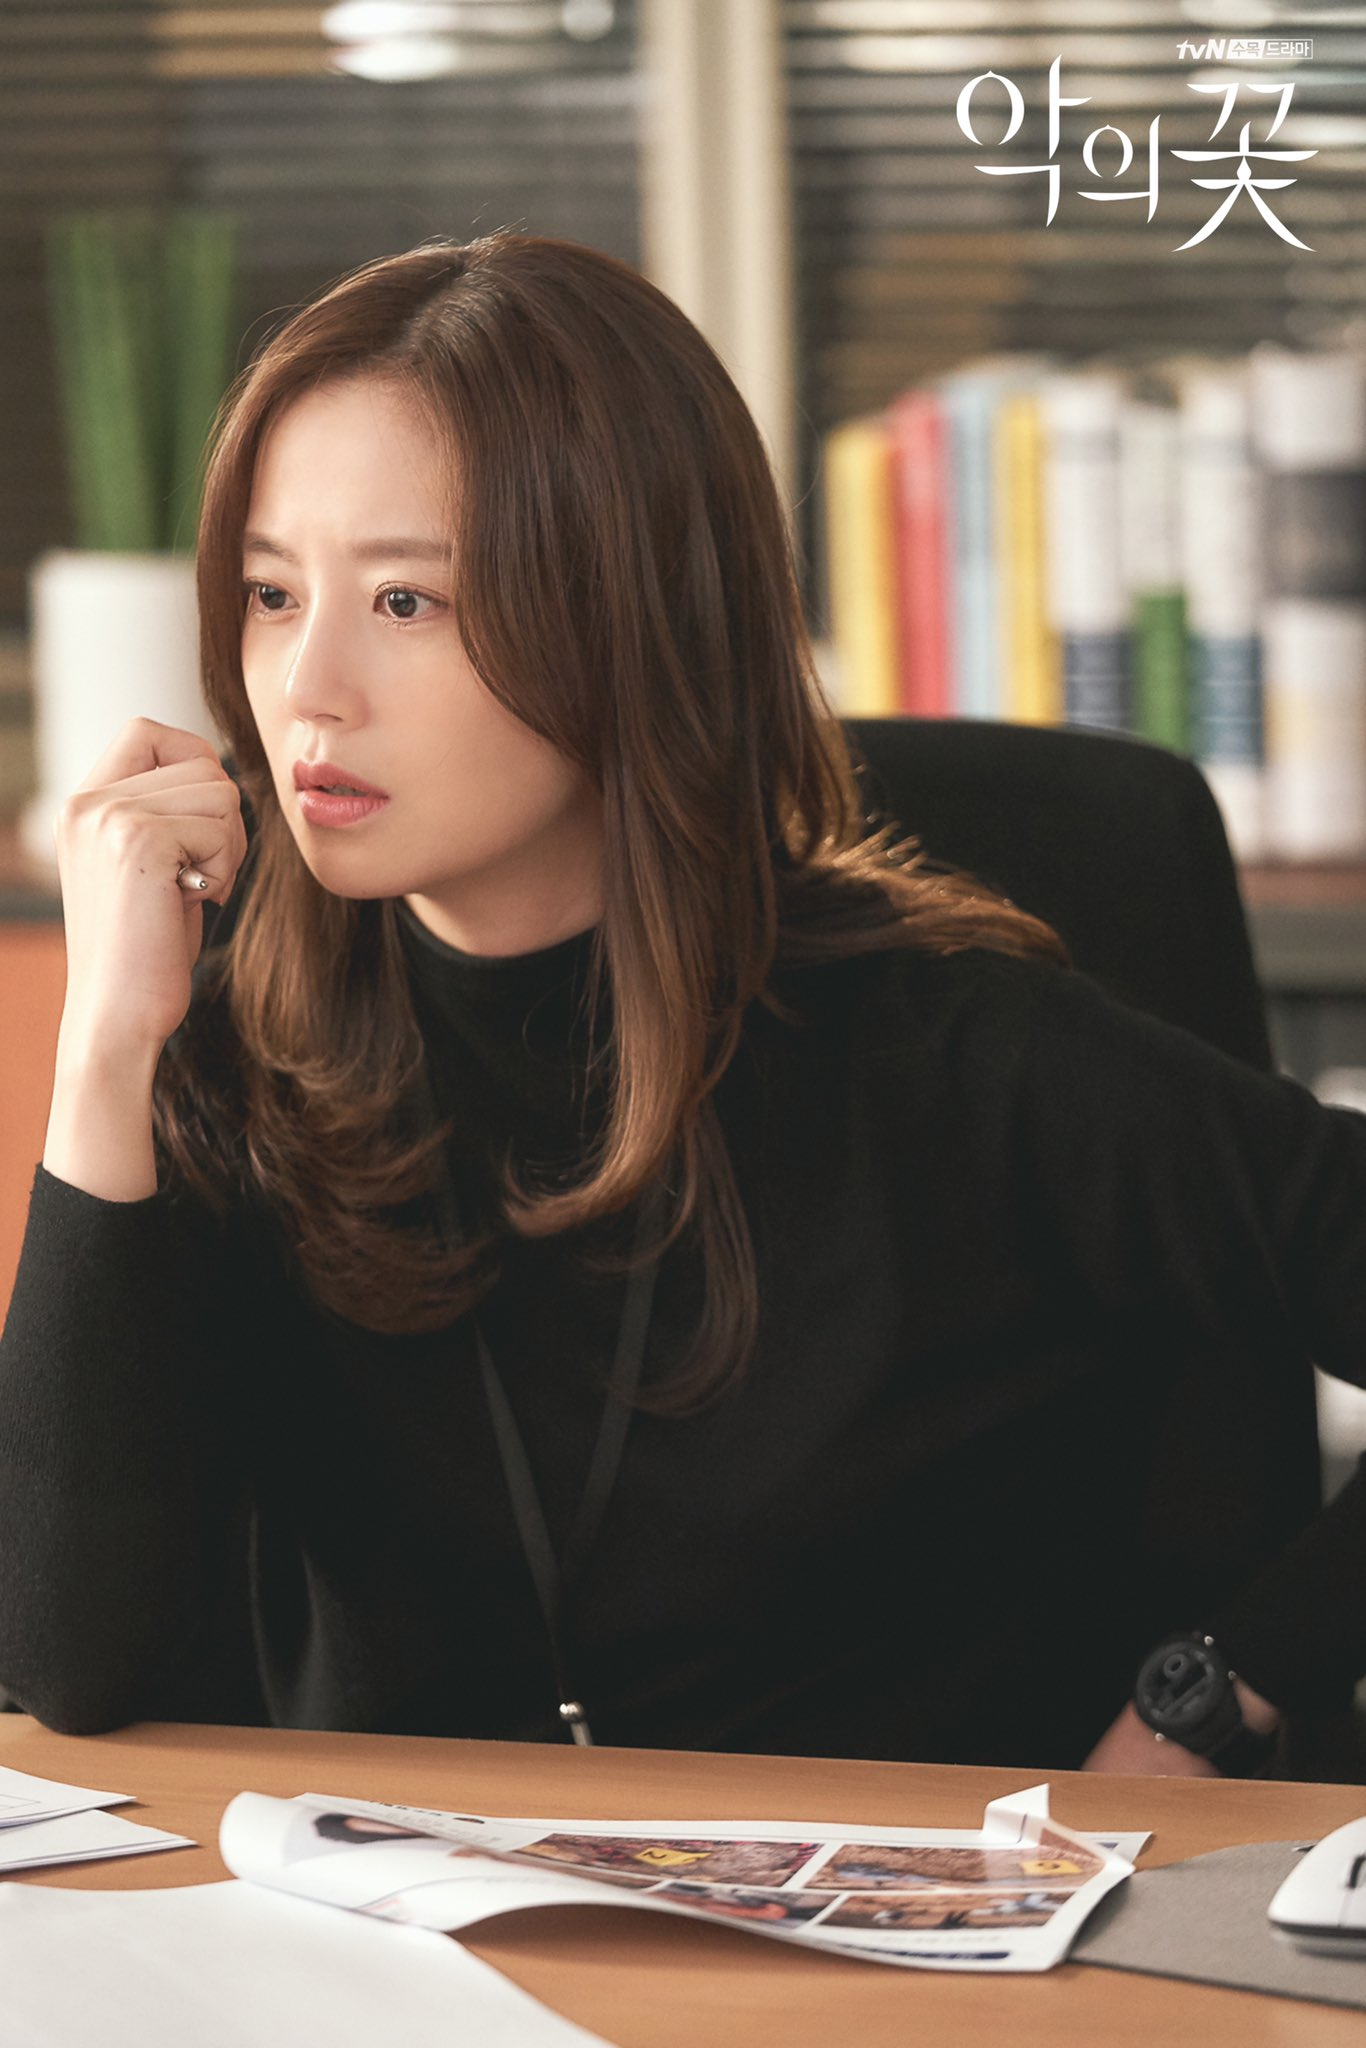 moon-chae-won-3.jpg